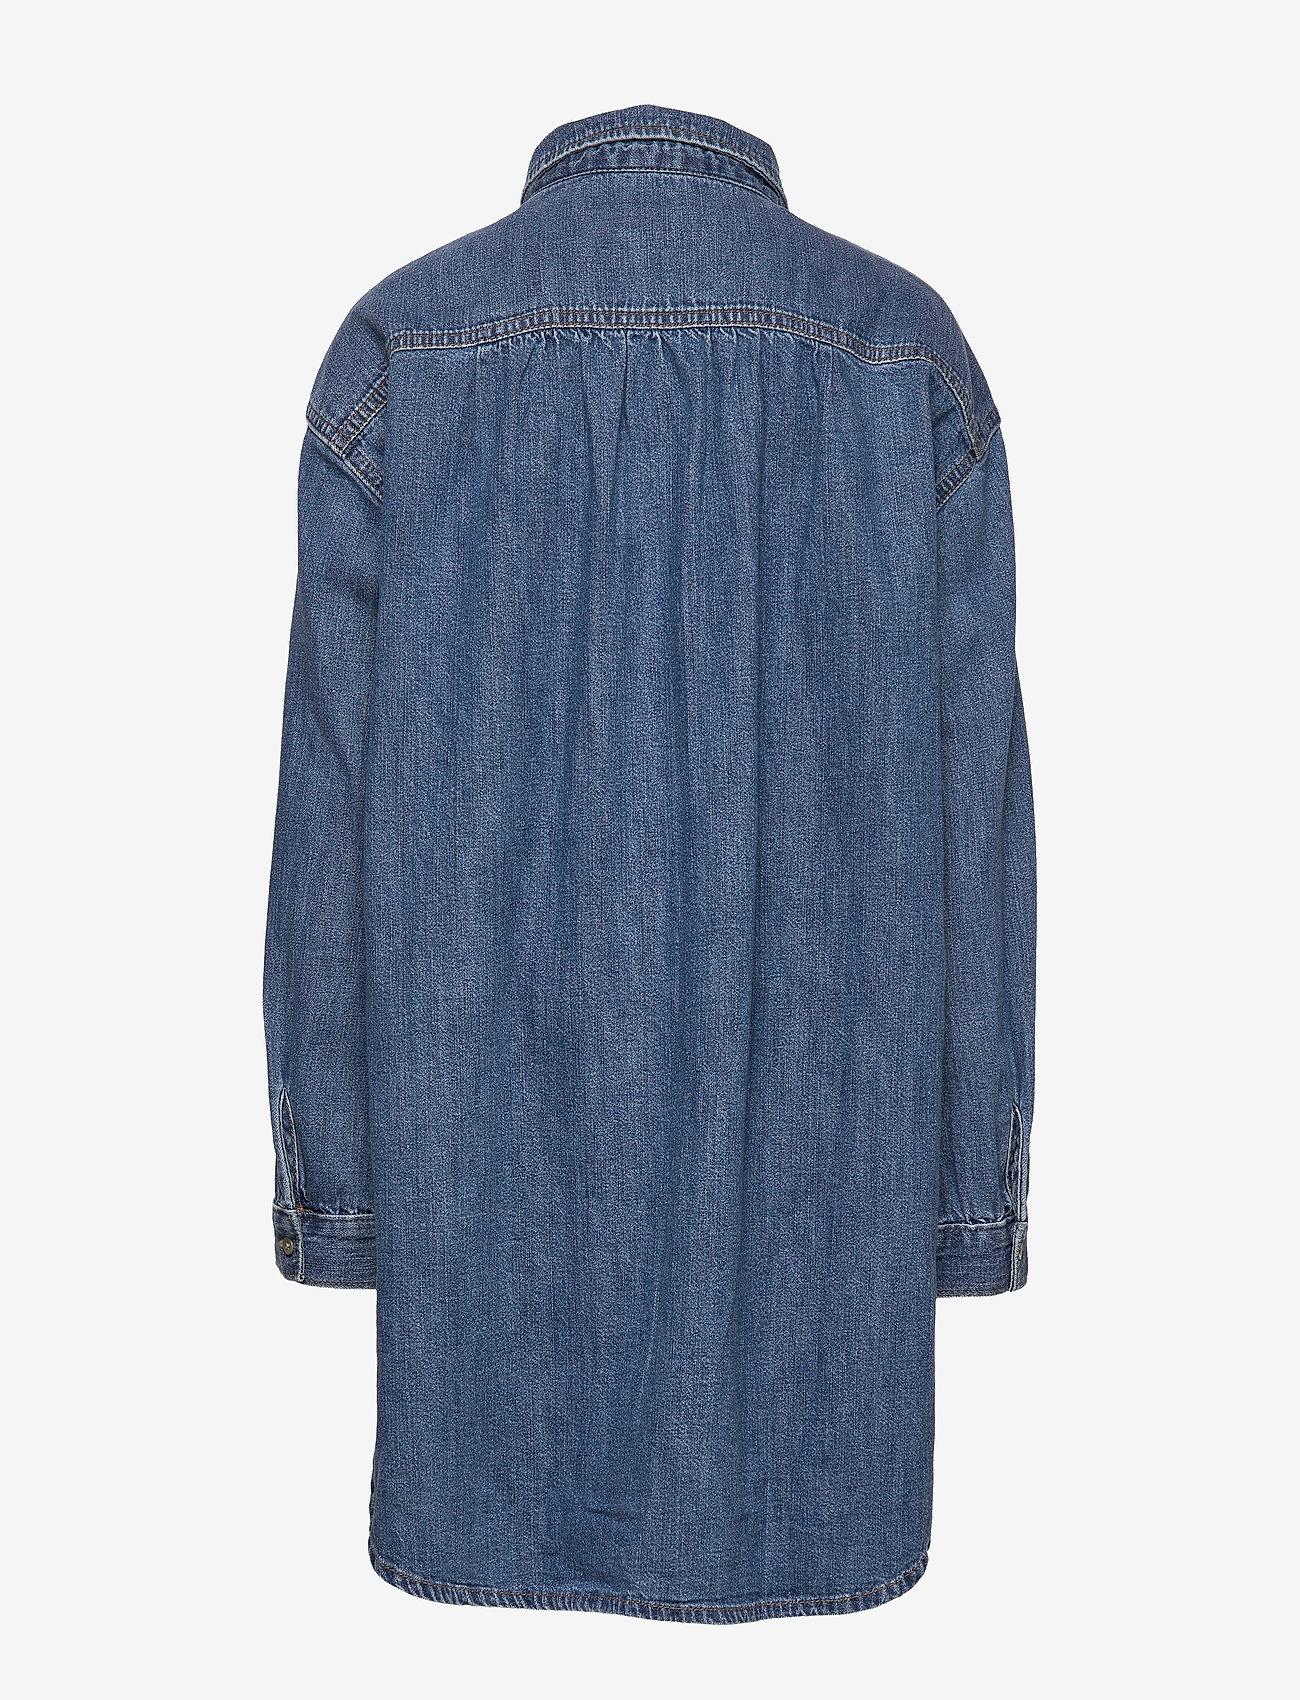 Kids Oversize Denim Shirt (Denim 616) (24.05 €) - GAP iokoc